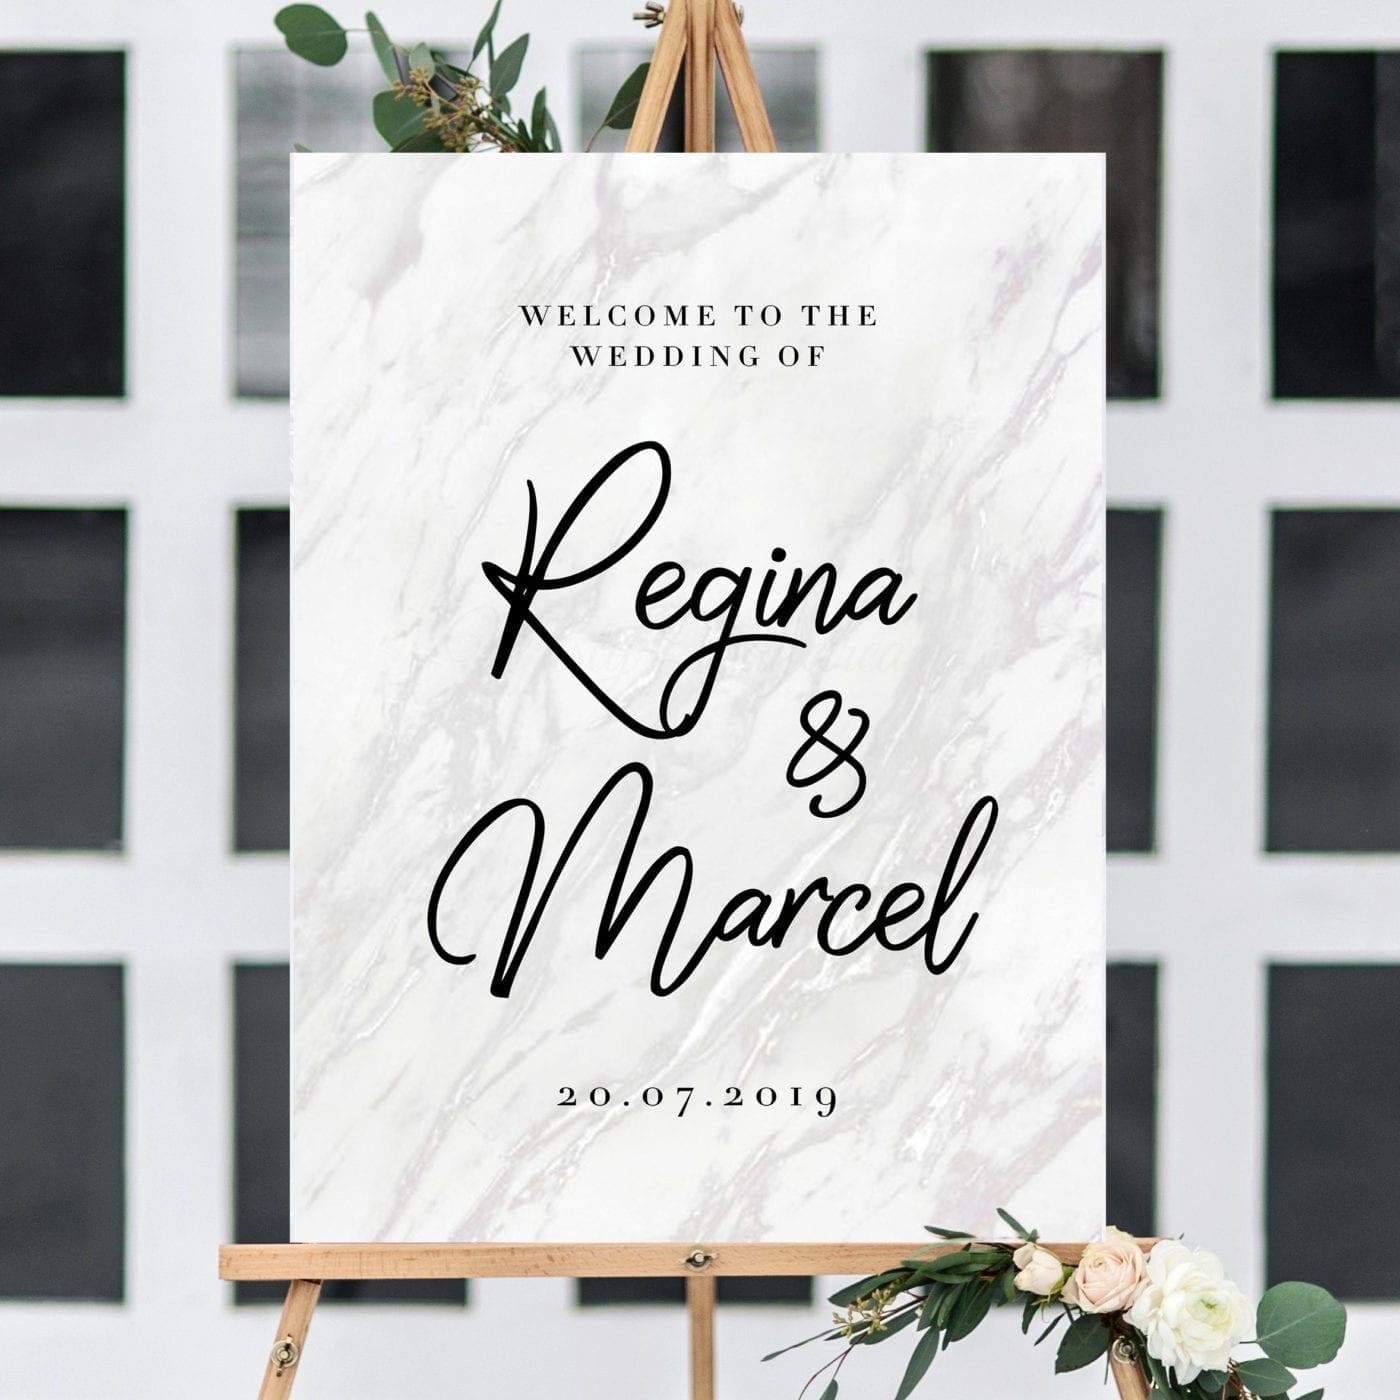 wedding welcome sign design 15 marble foam board